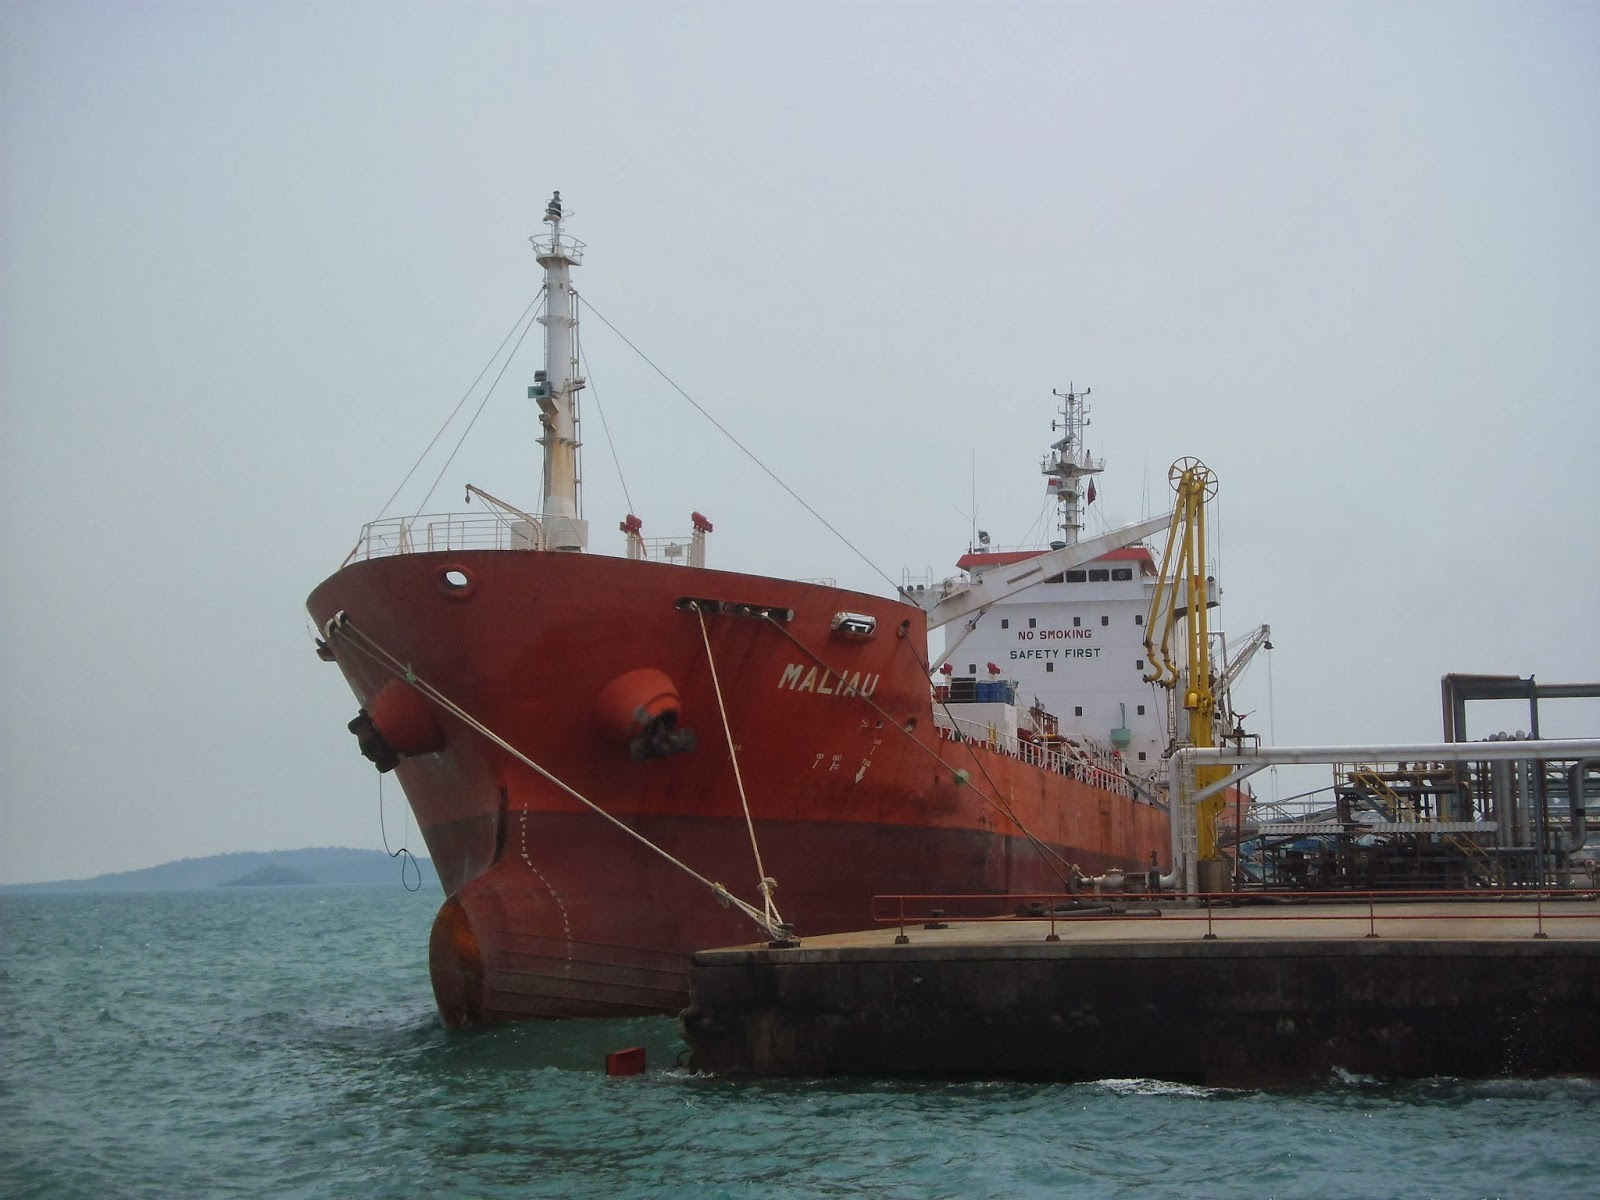 On Hire Survey Kapal Tanker Maliau